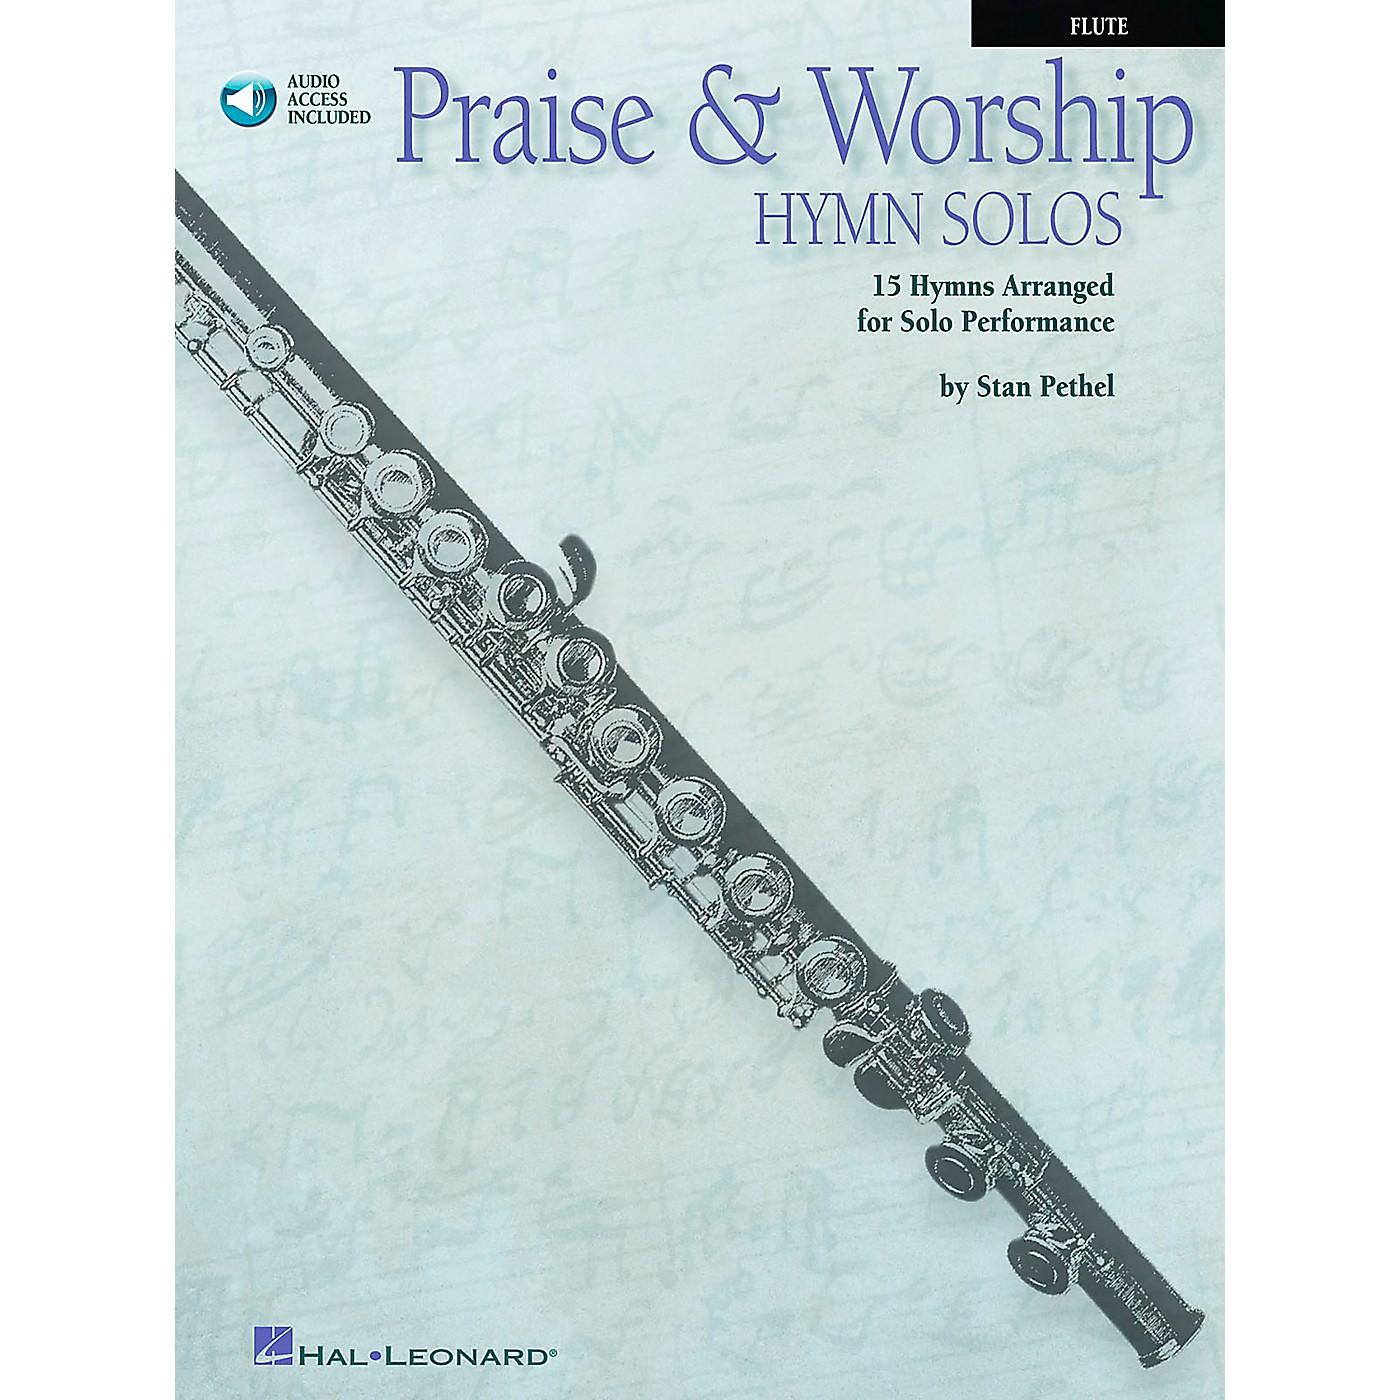 Hal Leonard Praise & Worship Hymn Solos - 15 Hymns Arranged for Solo Performance for Flute Book/CD Pkg thumbnail